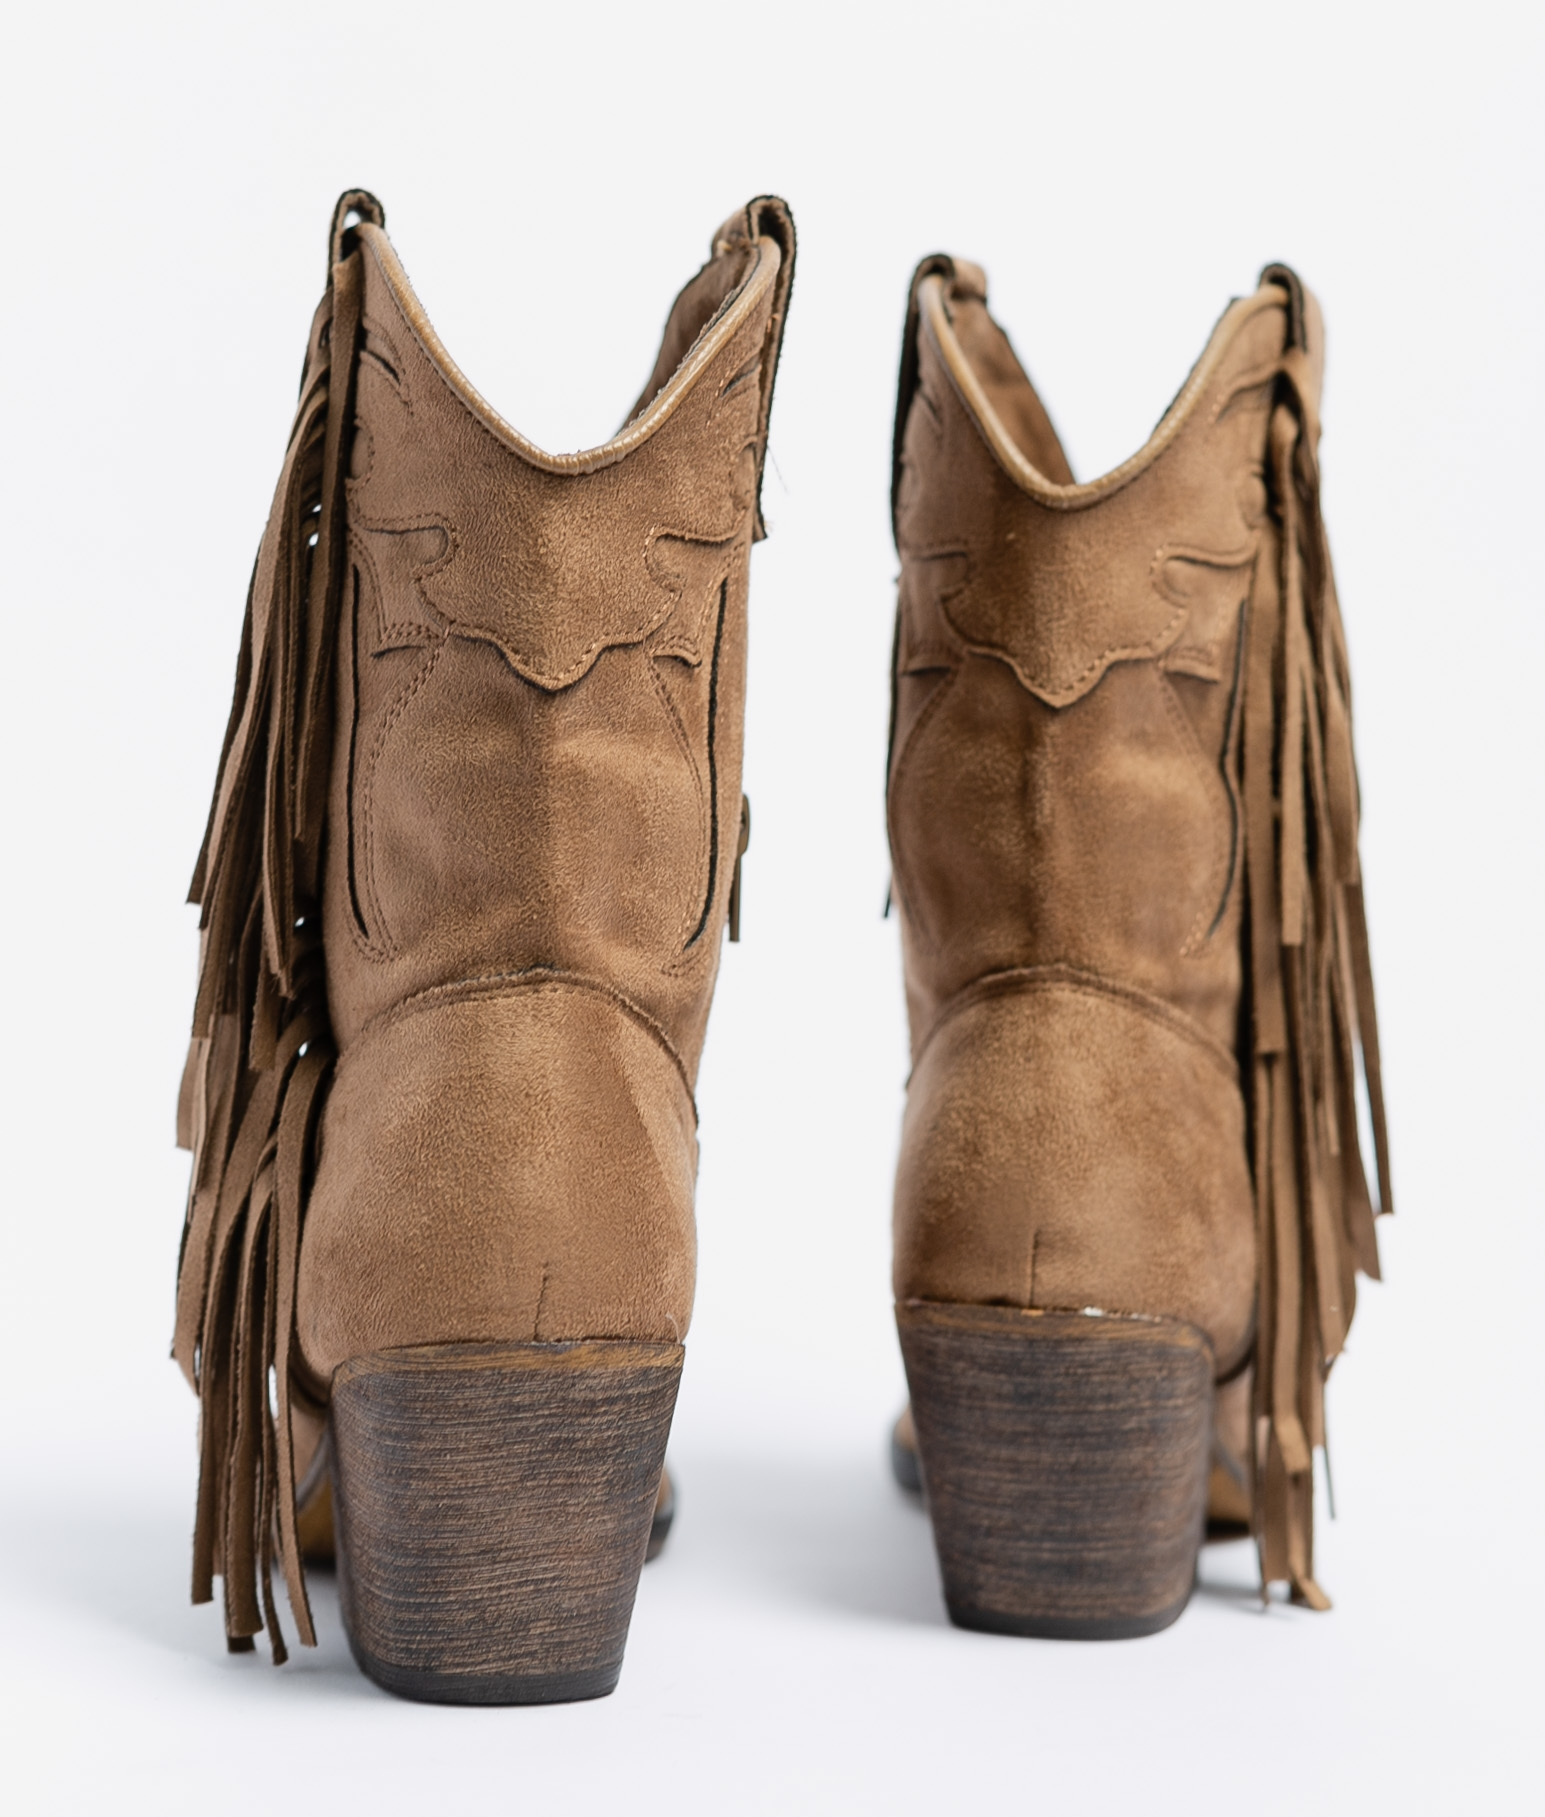 Bota Baja Amily - Camel